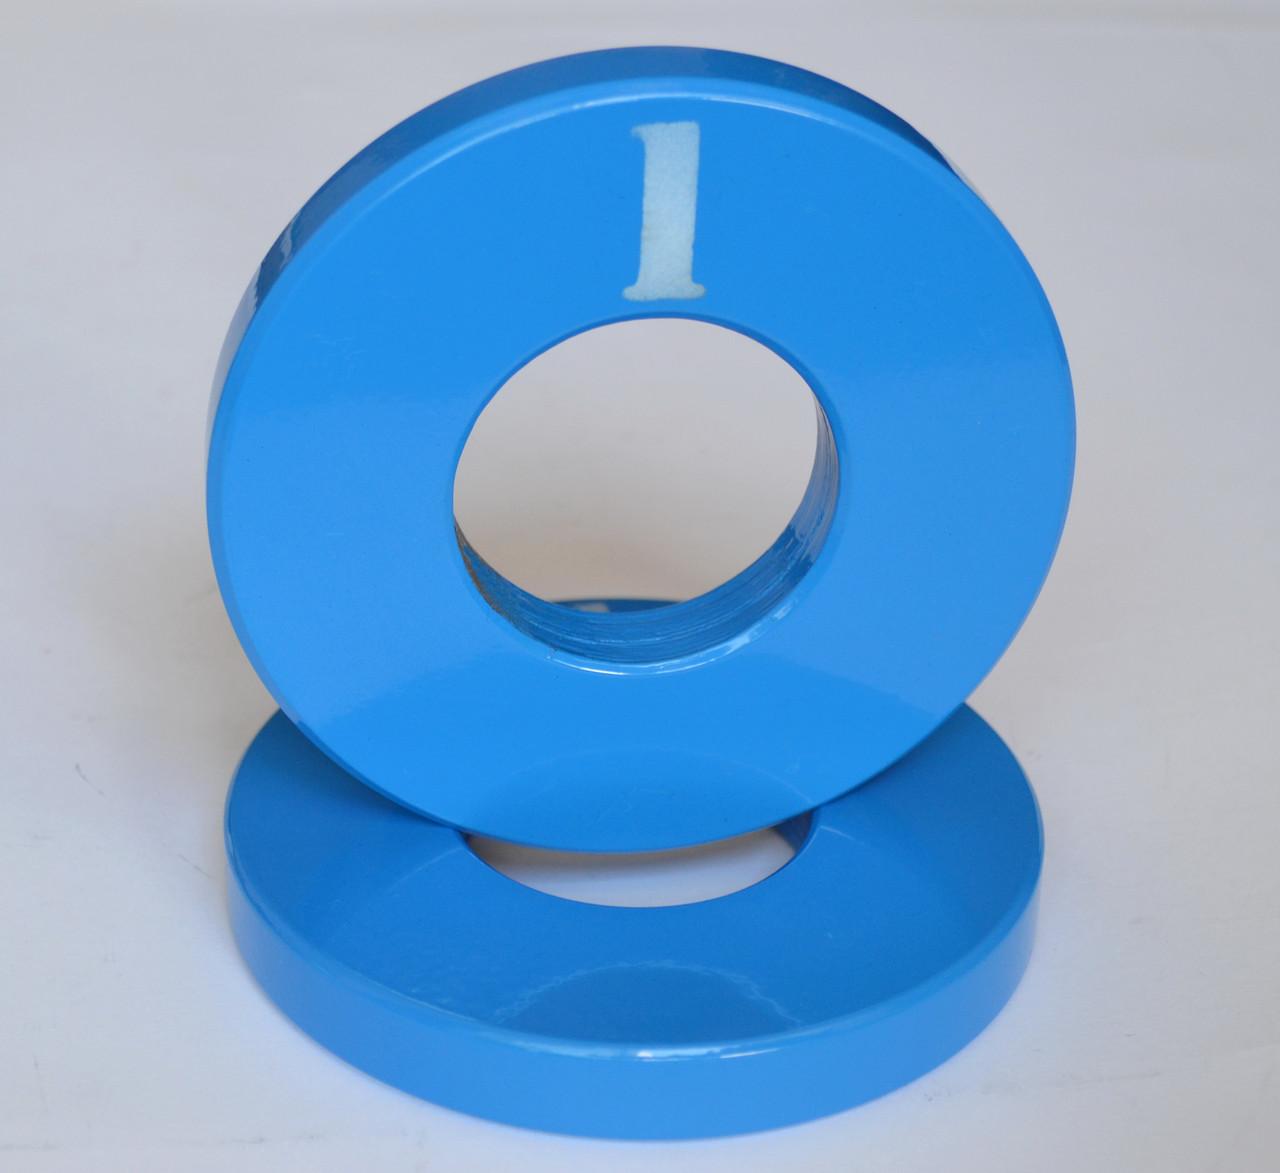 Диск олимпийский металлический 1 кг